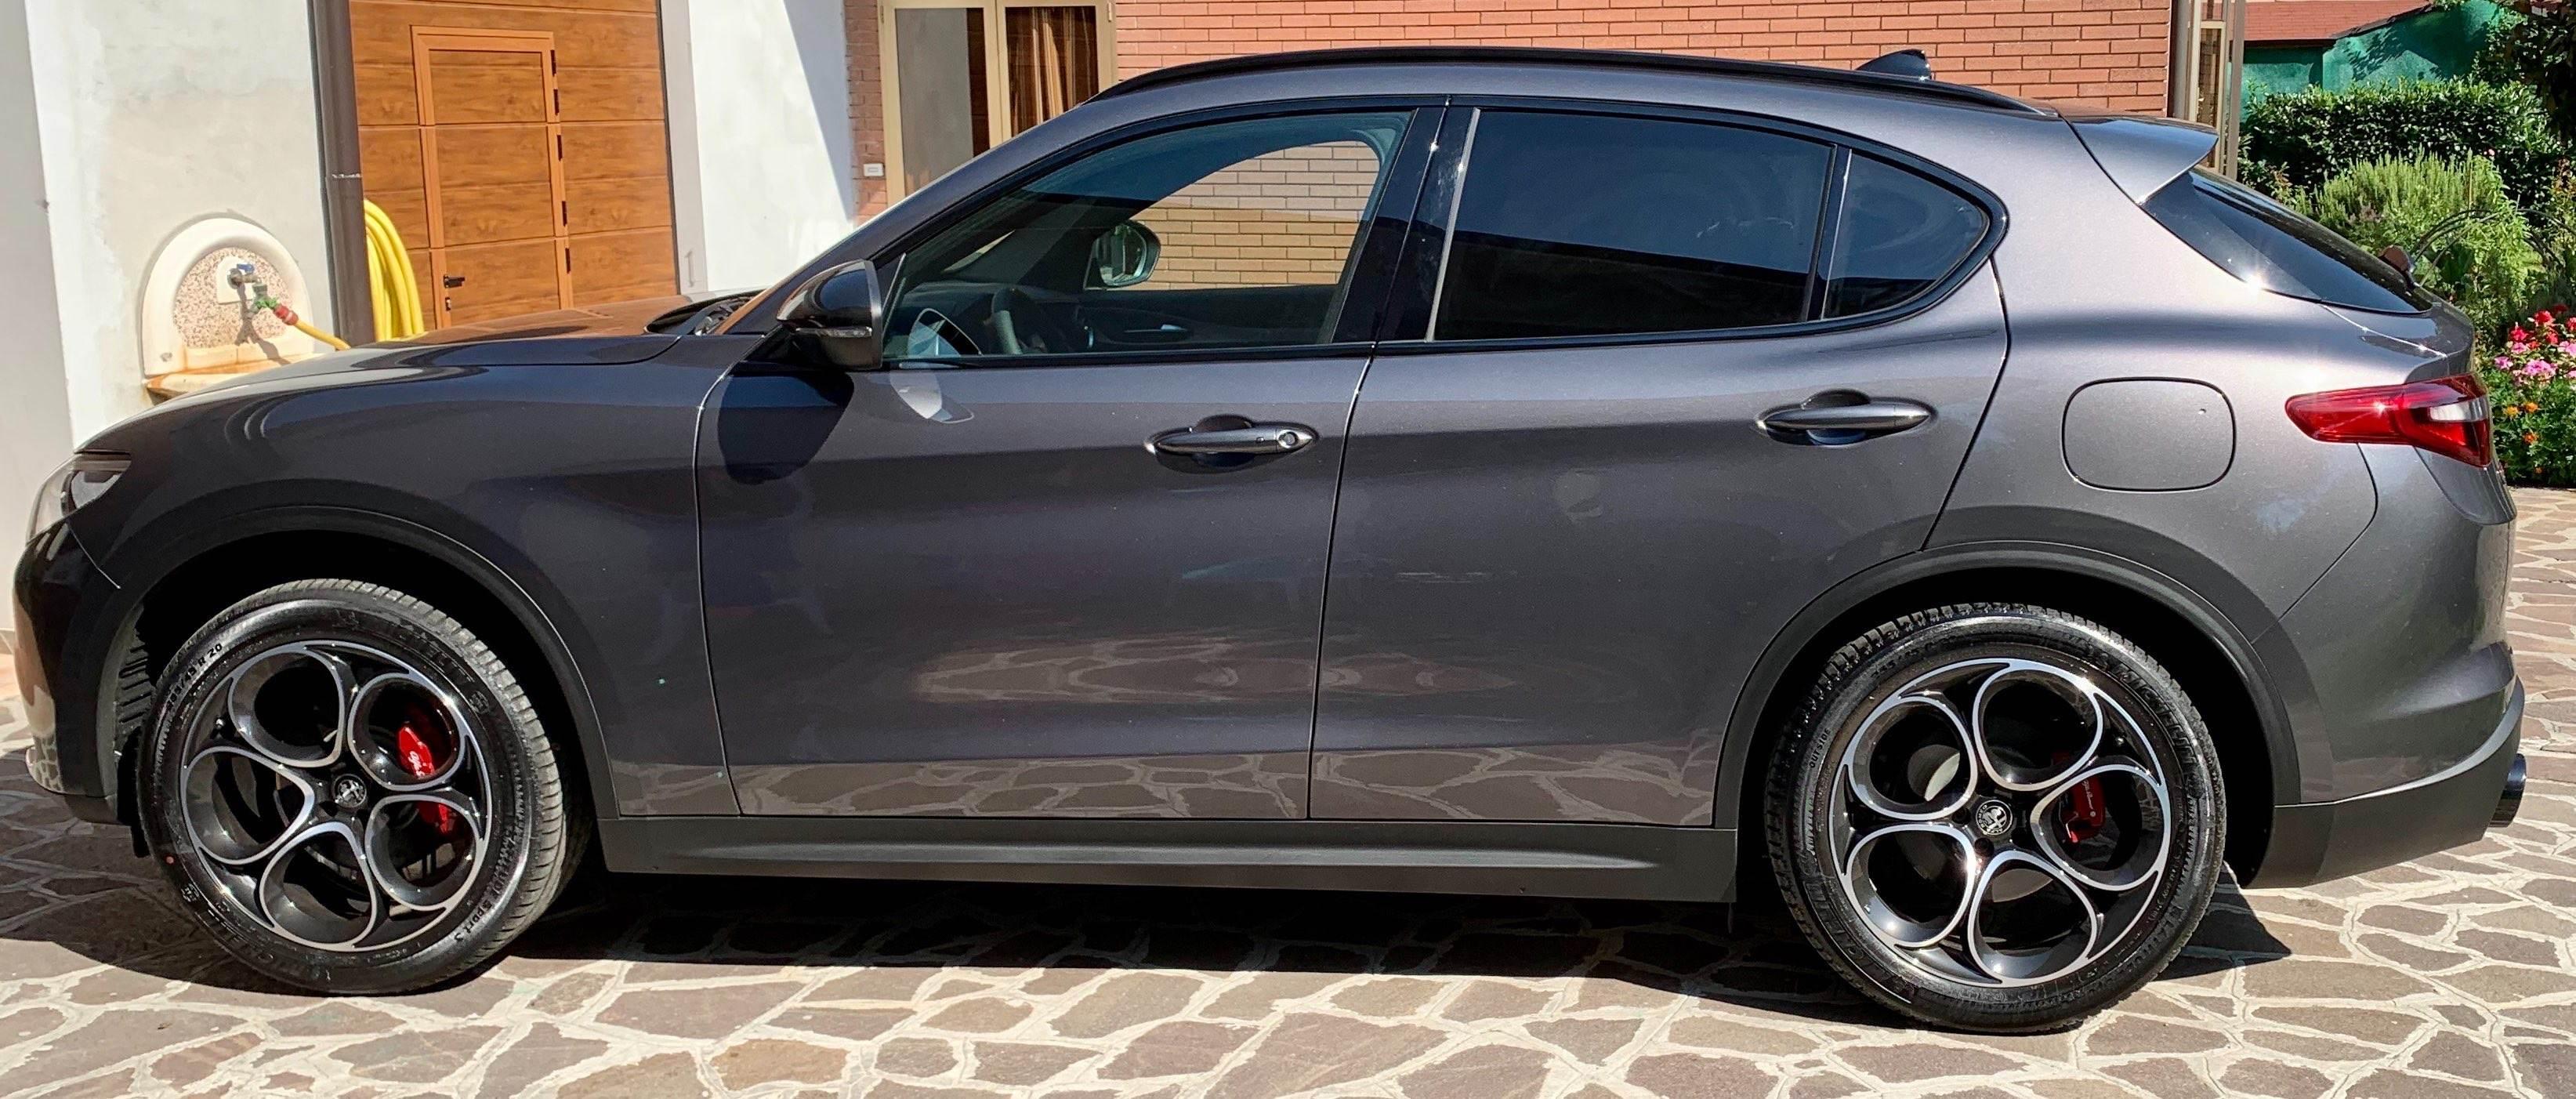 foto Alfa Romeo Stelvio- 2.0 TB 200cv - AT8 - Q4 - B-Tech my18 - Grigio Vesuvio - 2020 - MO - 1